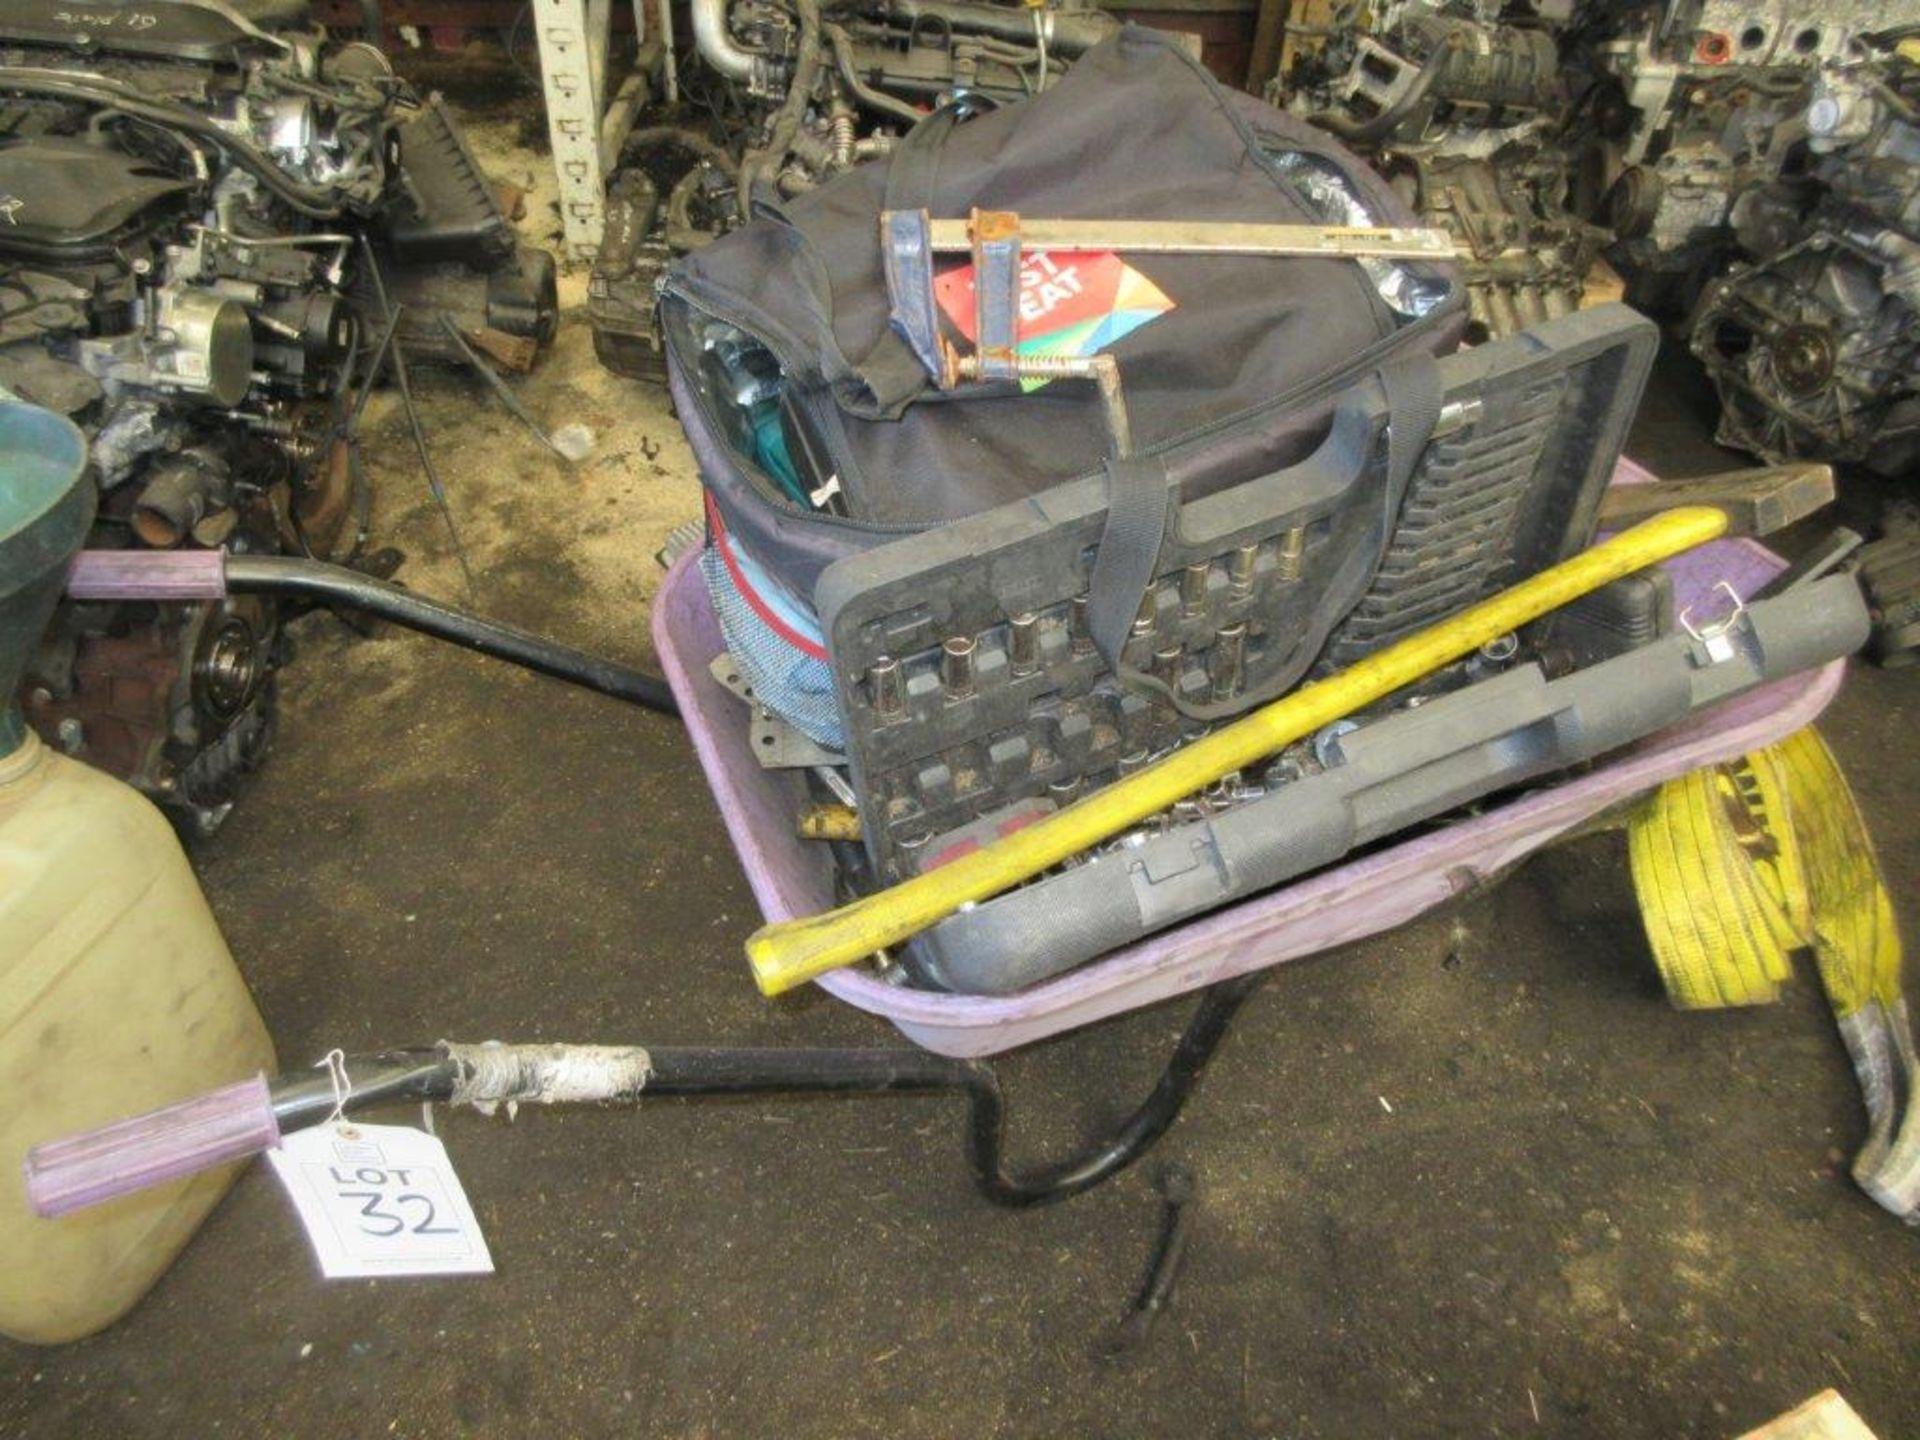 Lot 32 - Plastic wheelbarrow and contents of hand tools, socket sets etc.